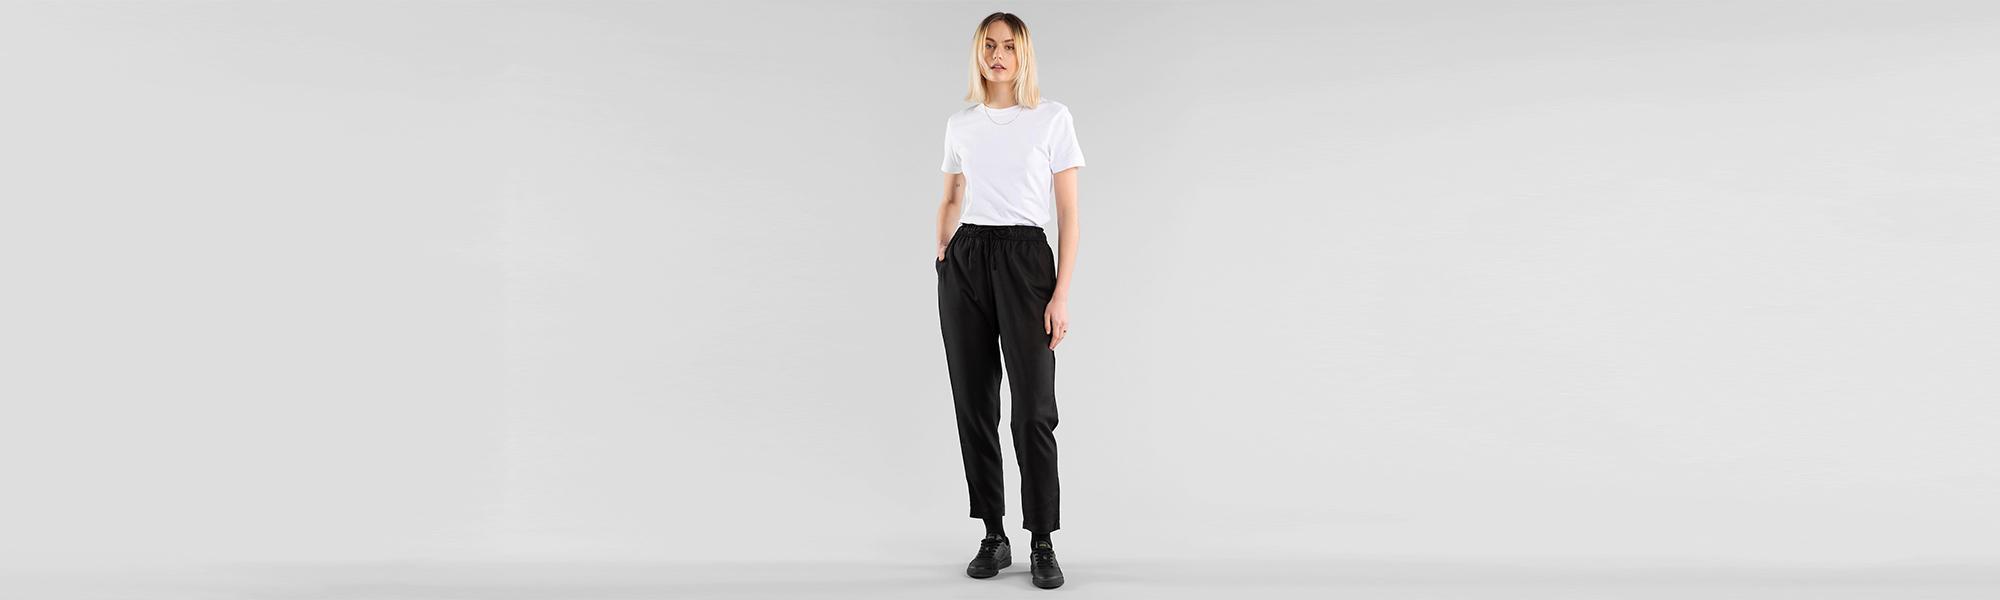 Women's Pants, Shorts & Skirts